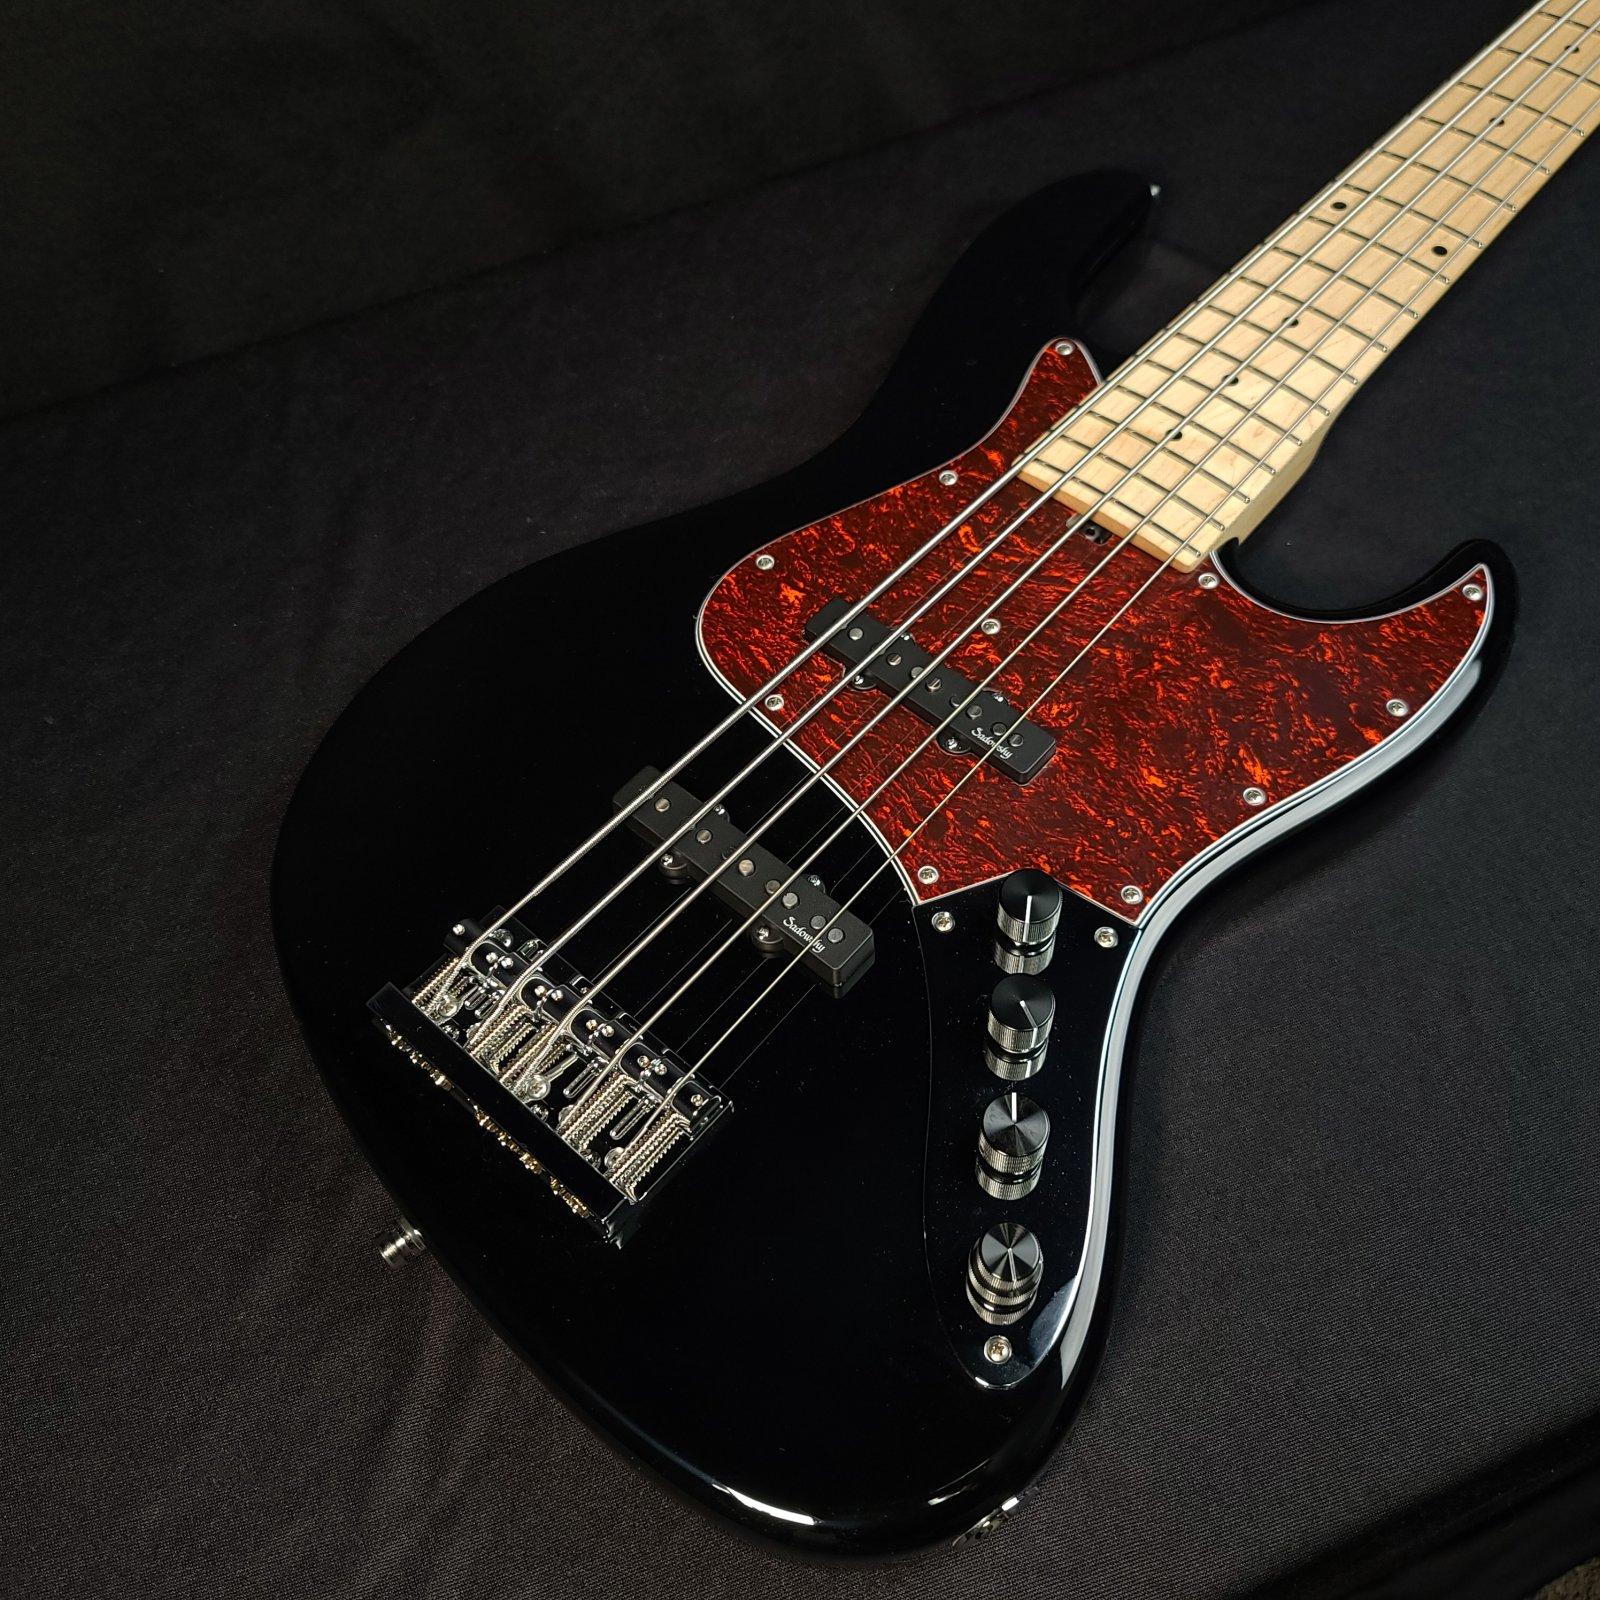 Sadowsky MetroLine 21 Fret Vintage 5 String Bass J/J Bass Black High Polish